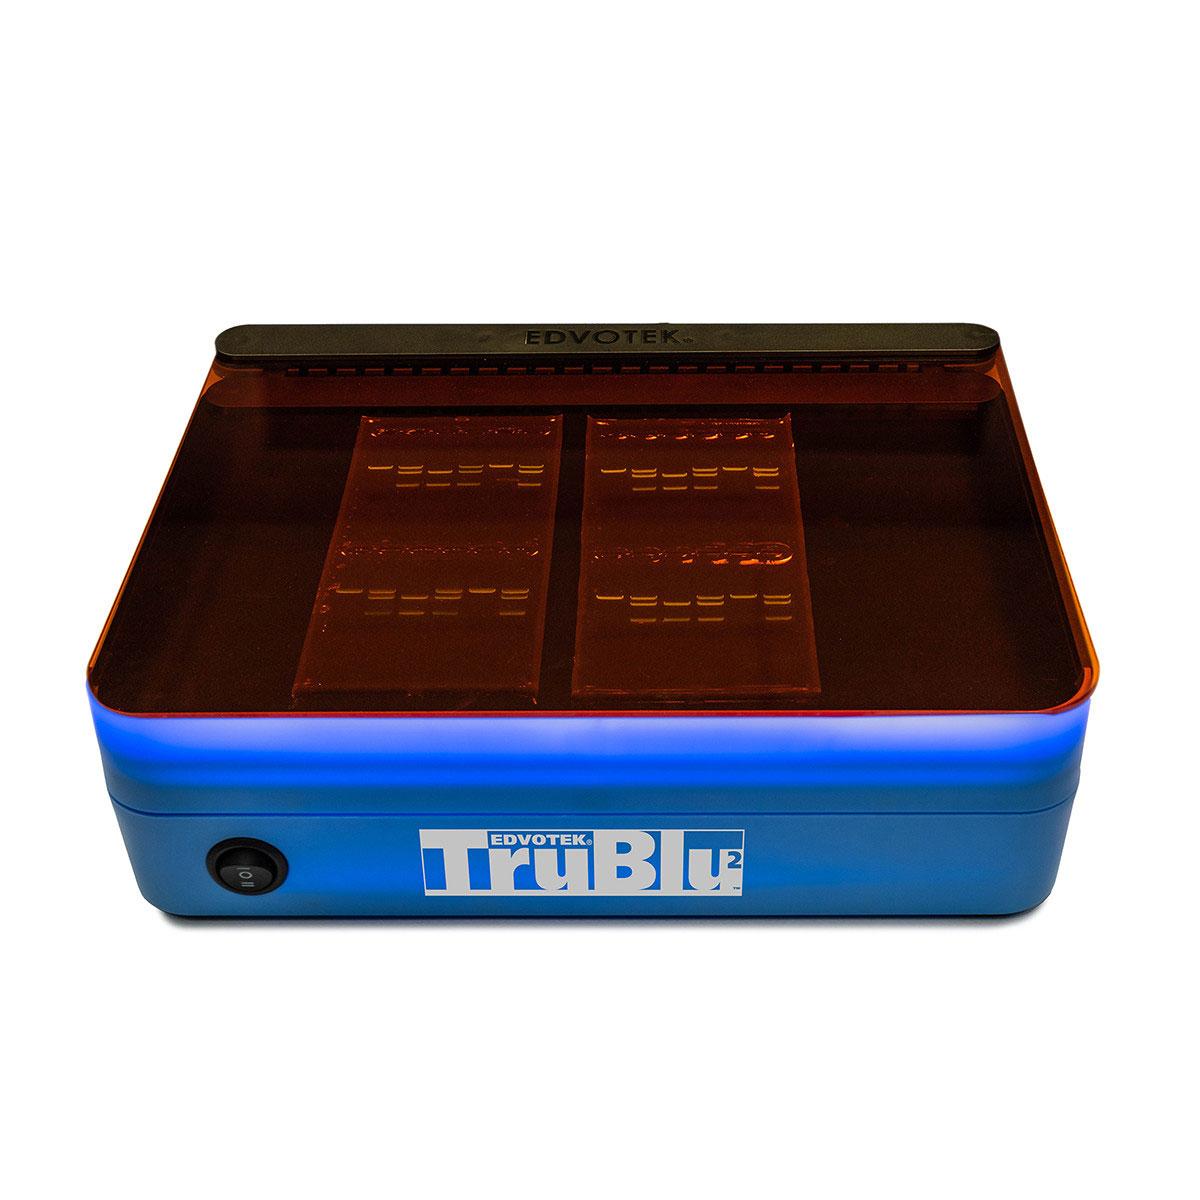 Transilluminator TruBlu2 - Edvotek